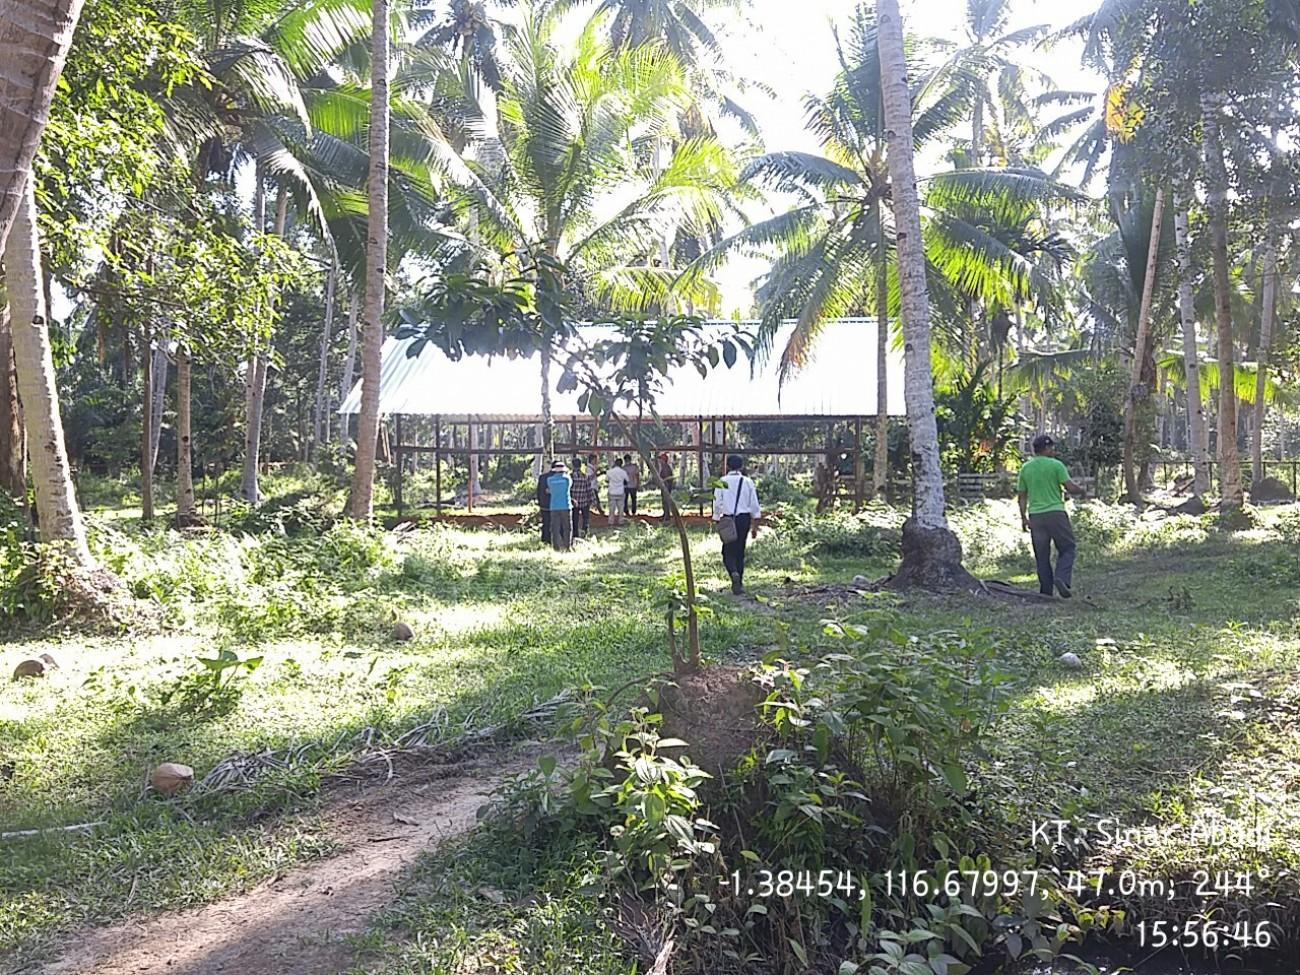 Dinas Peternakan Sudah Selesaikan Pembangunan Mini Ranch Di 5 Kabupaten Kota